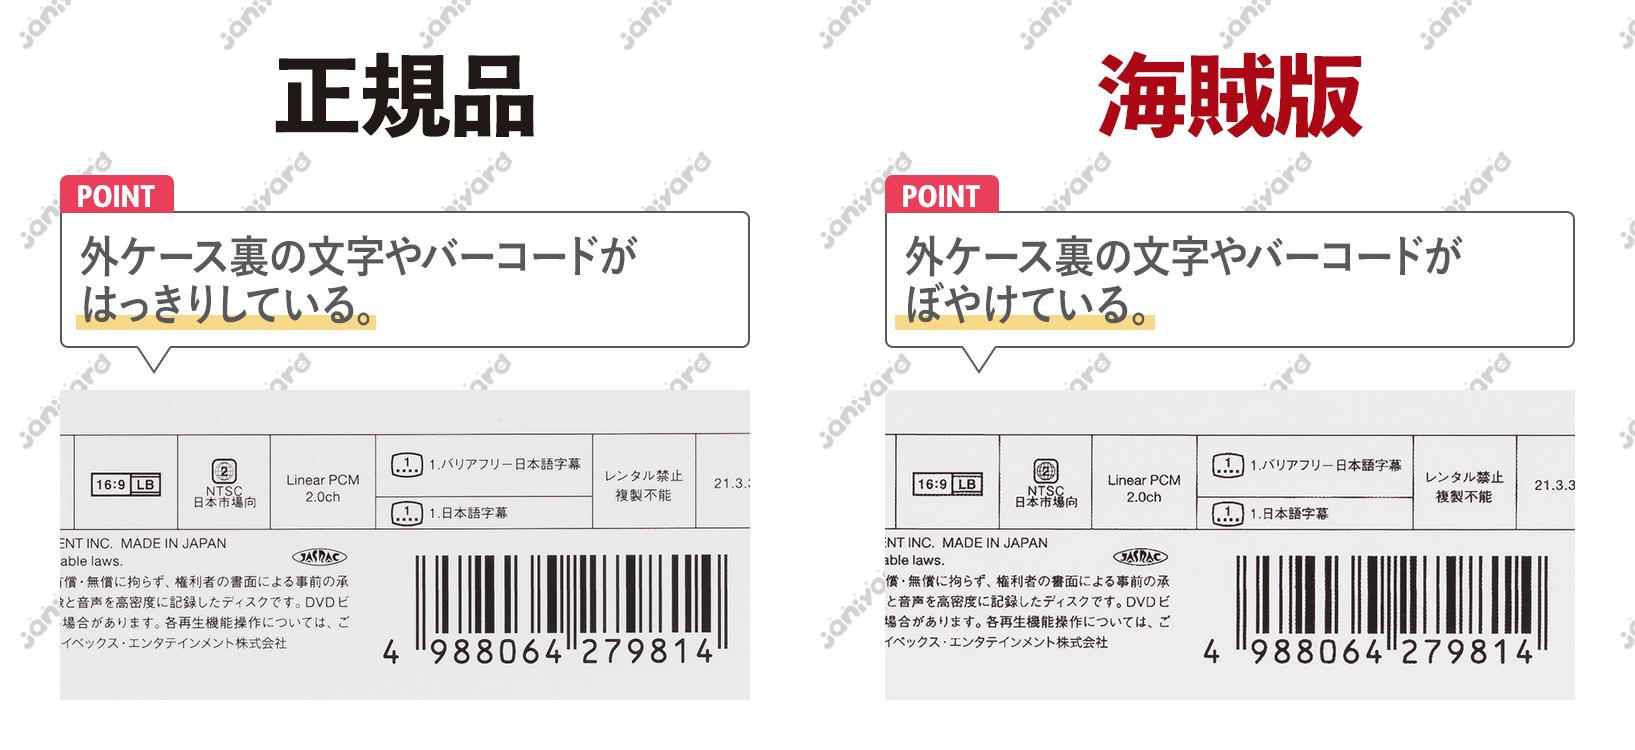 Snow Man ASIA TOUR 2D.2D. 外ケース 海賊版